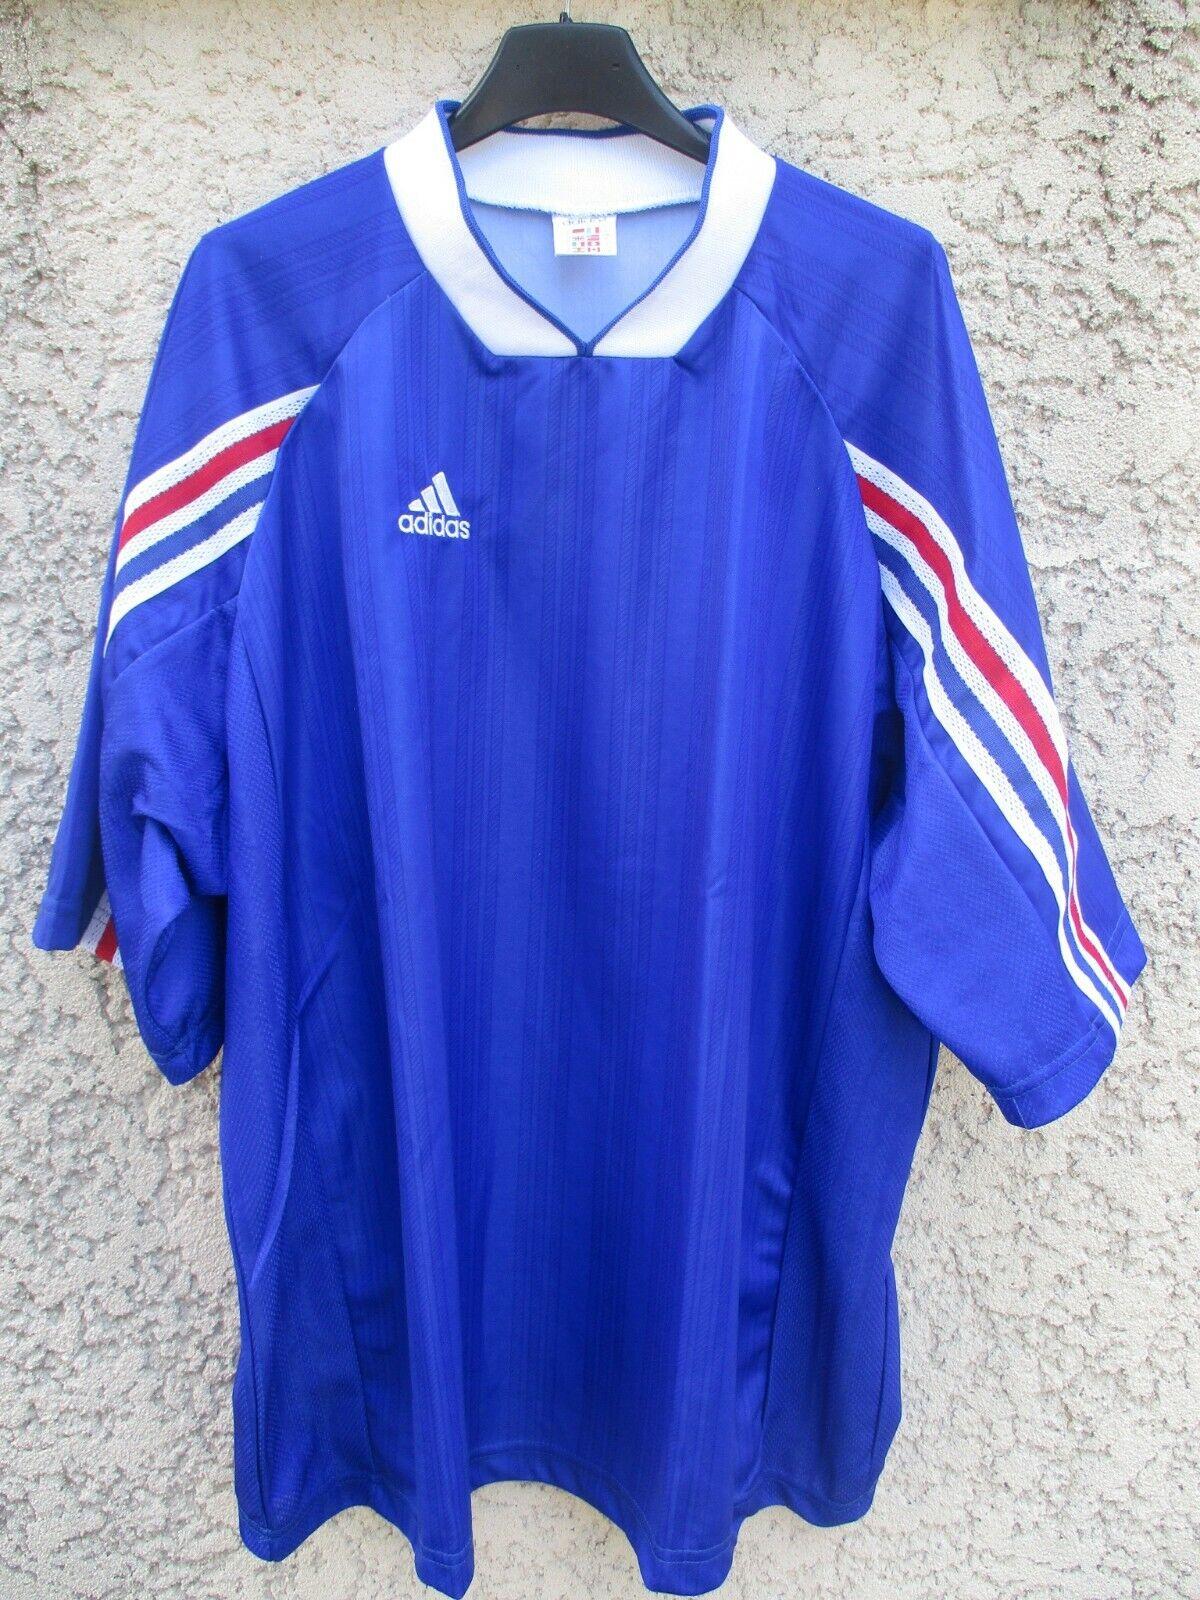 Maillot Equipe de FRANCE années 90 ADIDAS vintage shirt jersey trikot XL